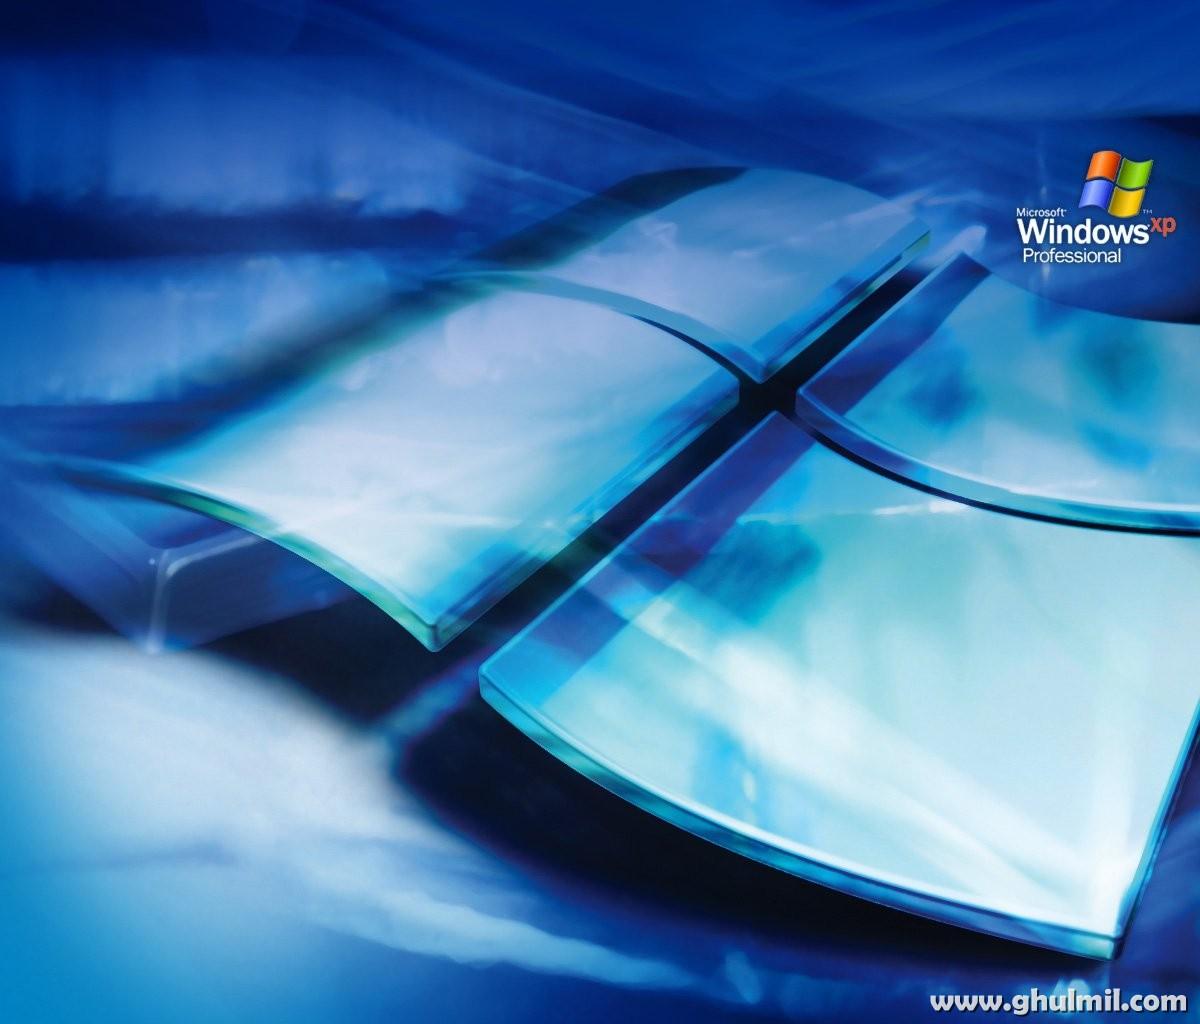 Windows xp blue wallpapers 72 wallpapers hd wallpapers for Fond ecran xp